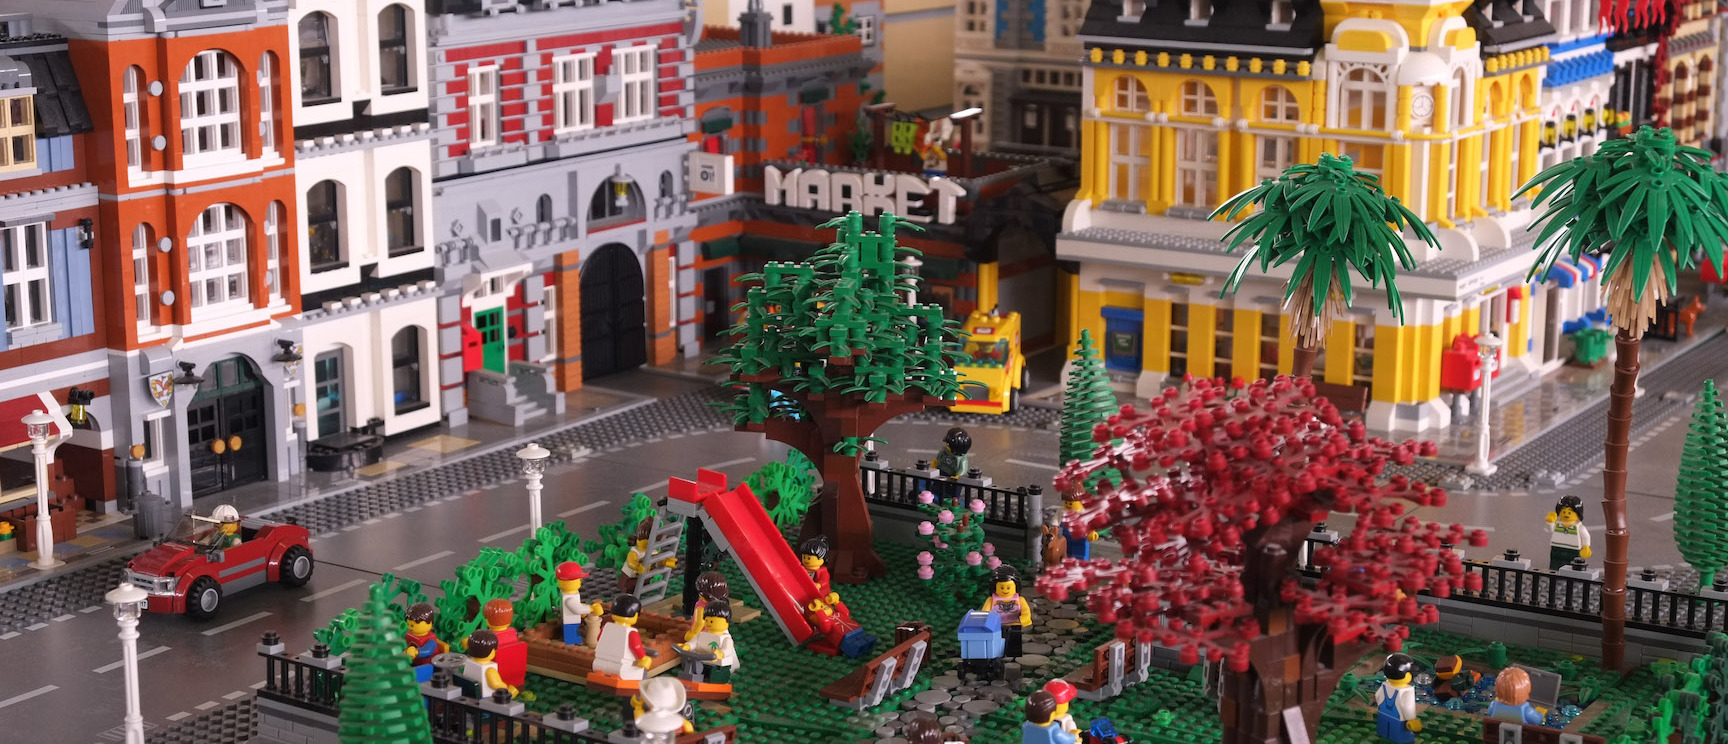 I Love Lego – PALP – Palazzo Pretorio, Pontedera (Pisa)